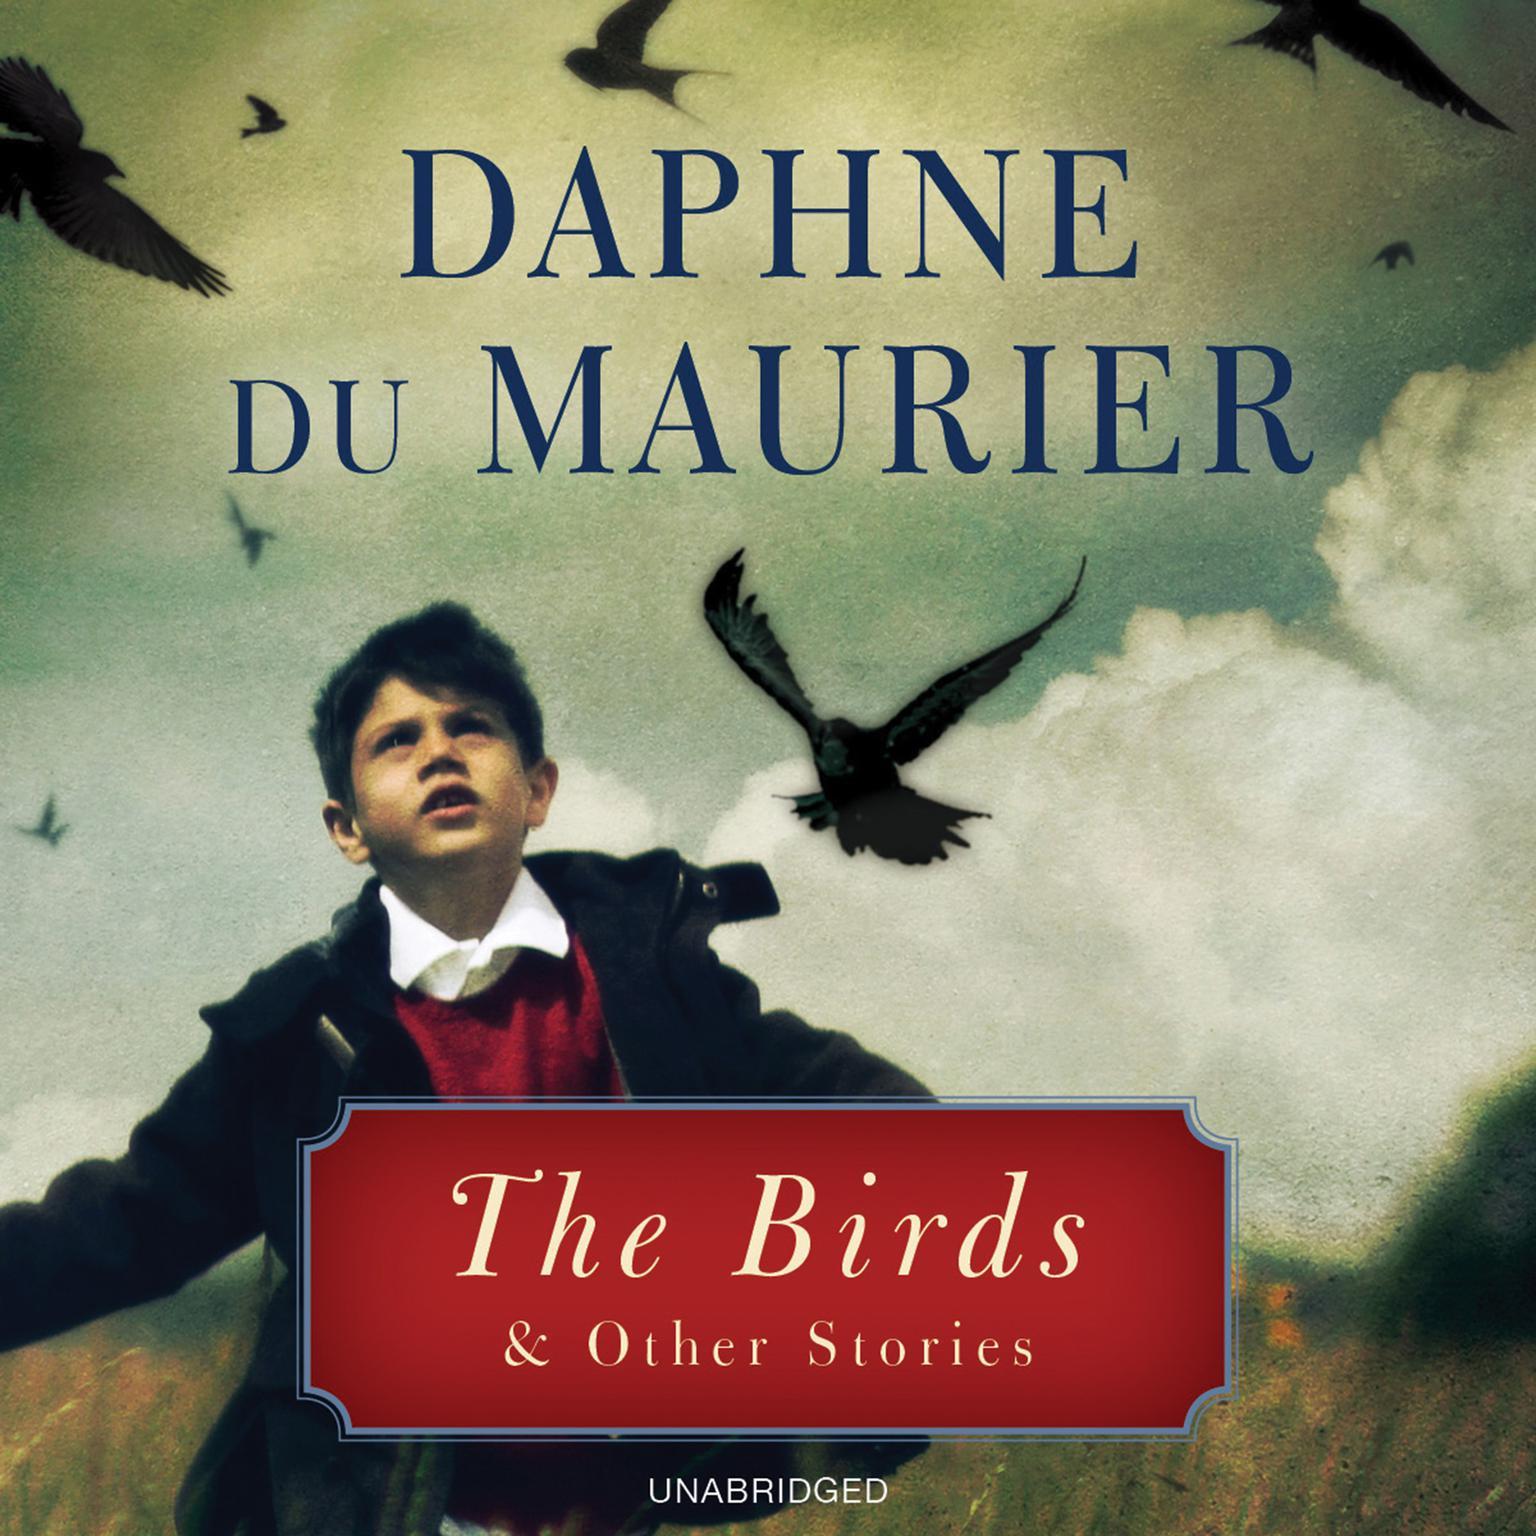 an analysis of the birds a short story and film written by daphne du maurrier